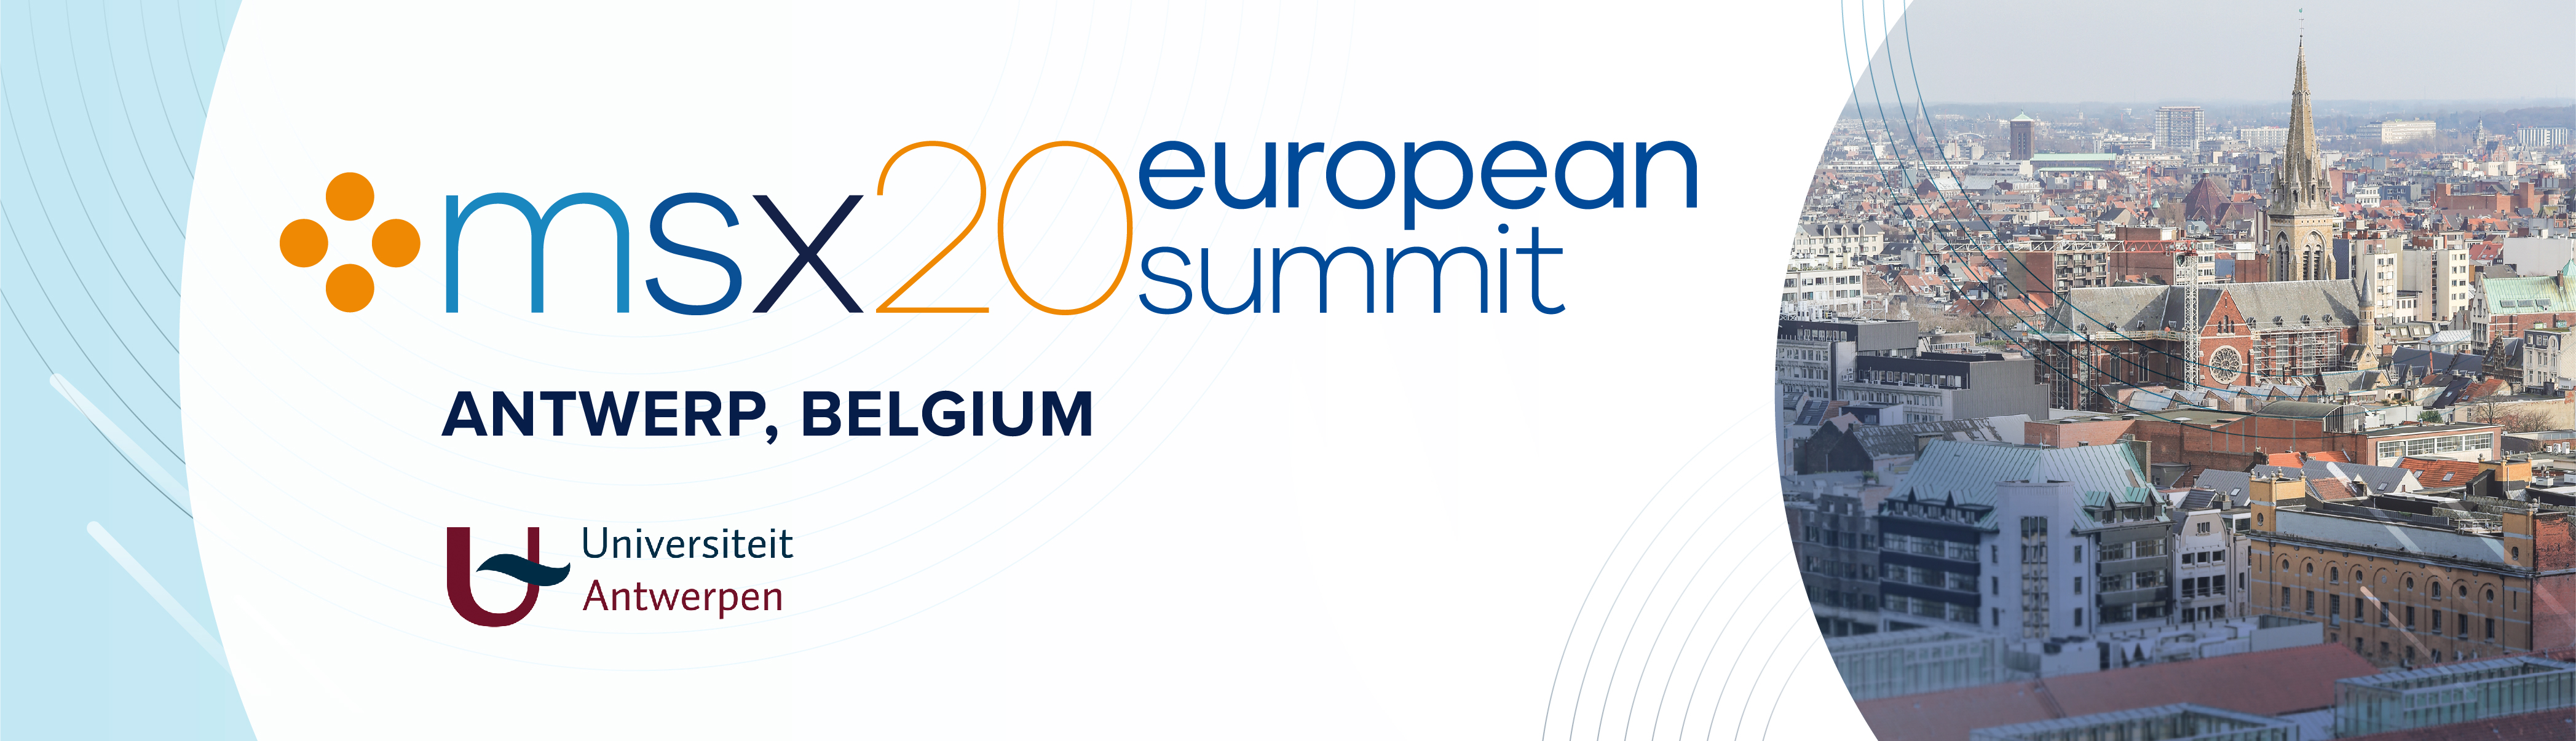 msx european summit